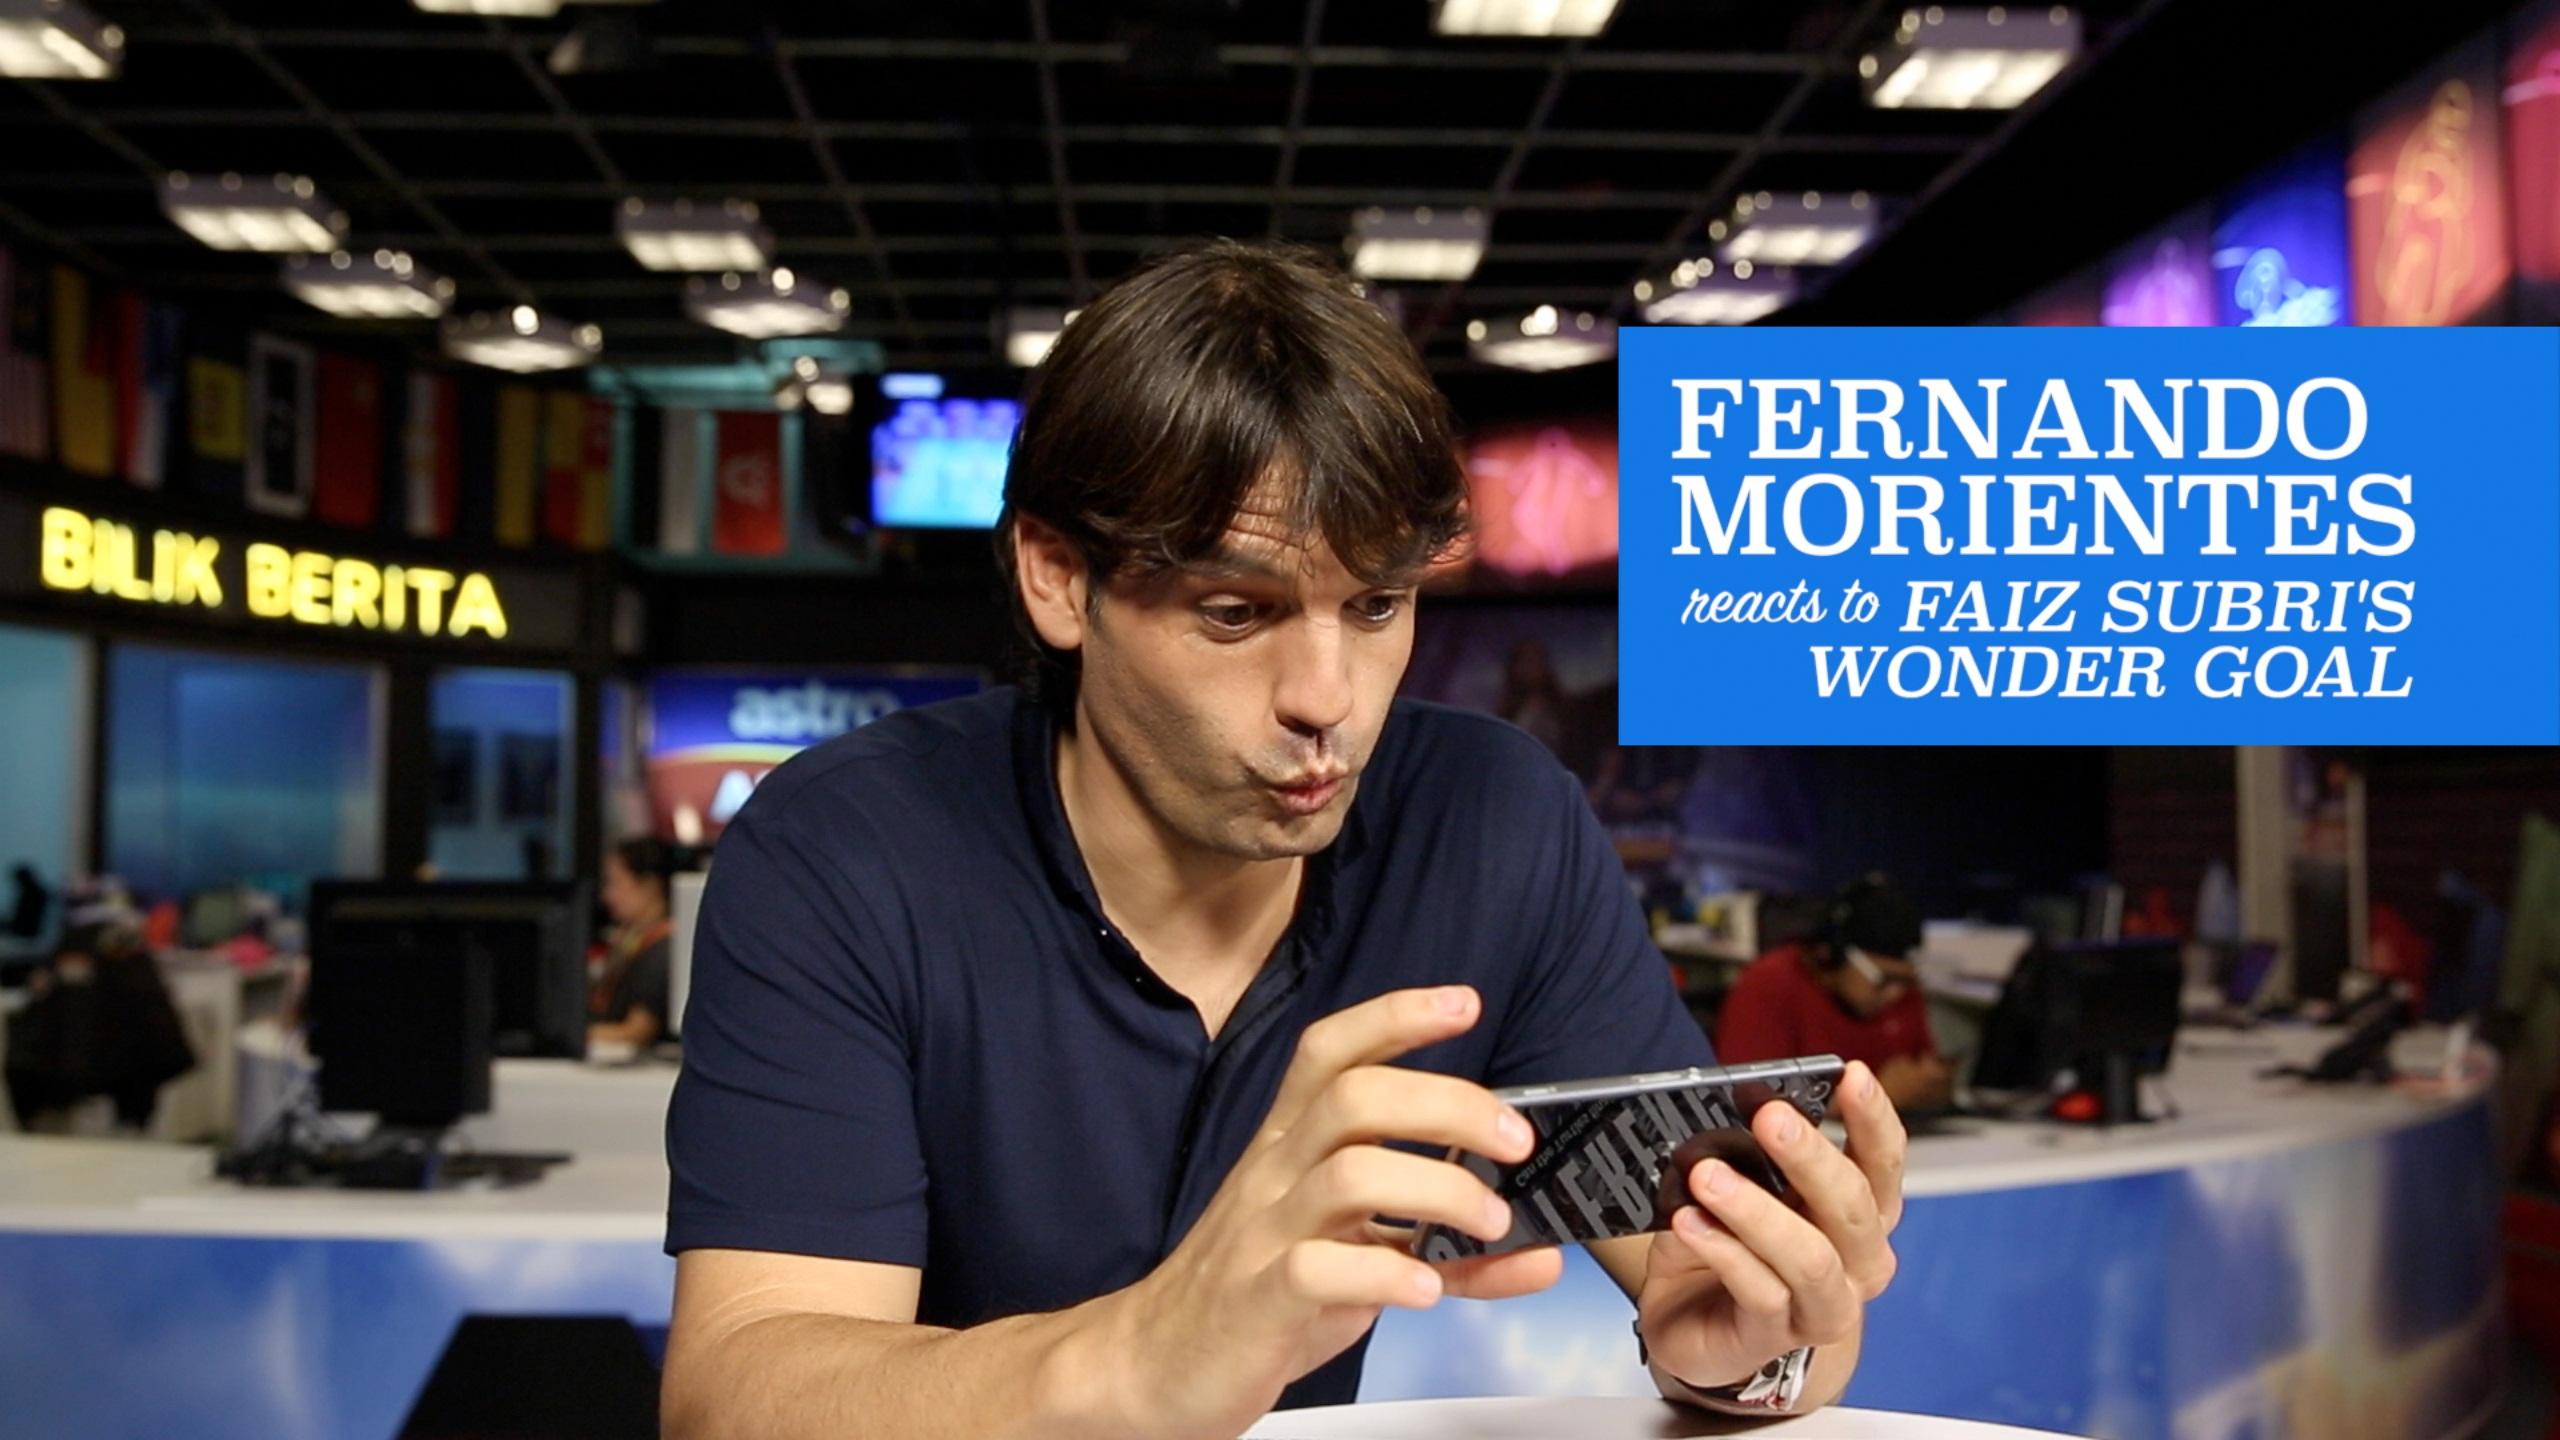 Fernando Morientes Reacts to Faiz Subri's Wonder Goal